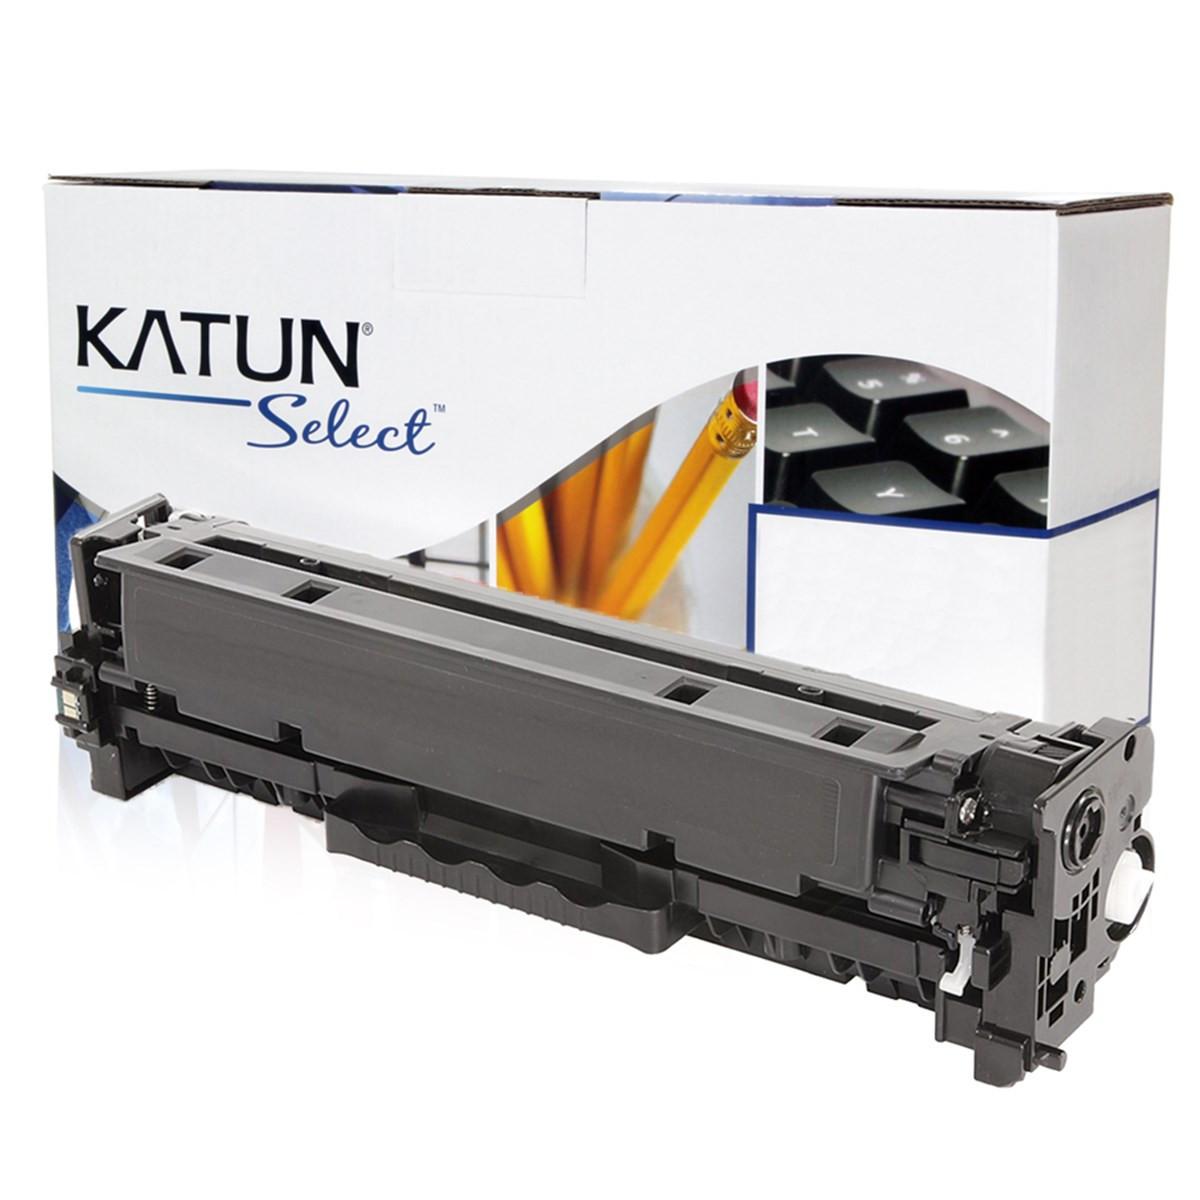 Toner Compatível com HP CE413A 305A Magenta | M451 M475 M375 M451DW M475DW | Katun Select 2.6k